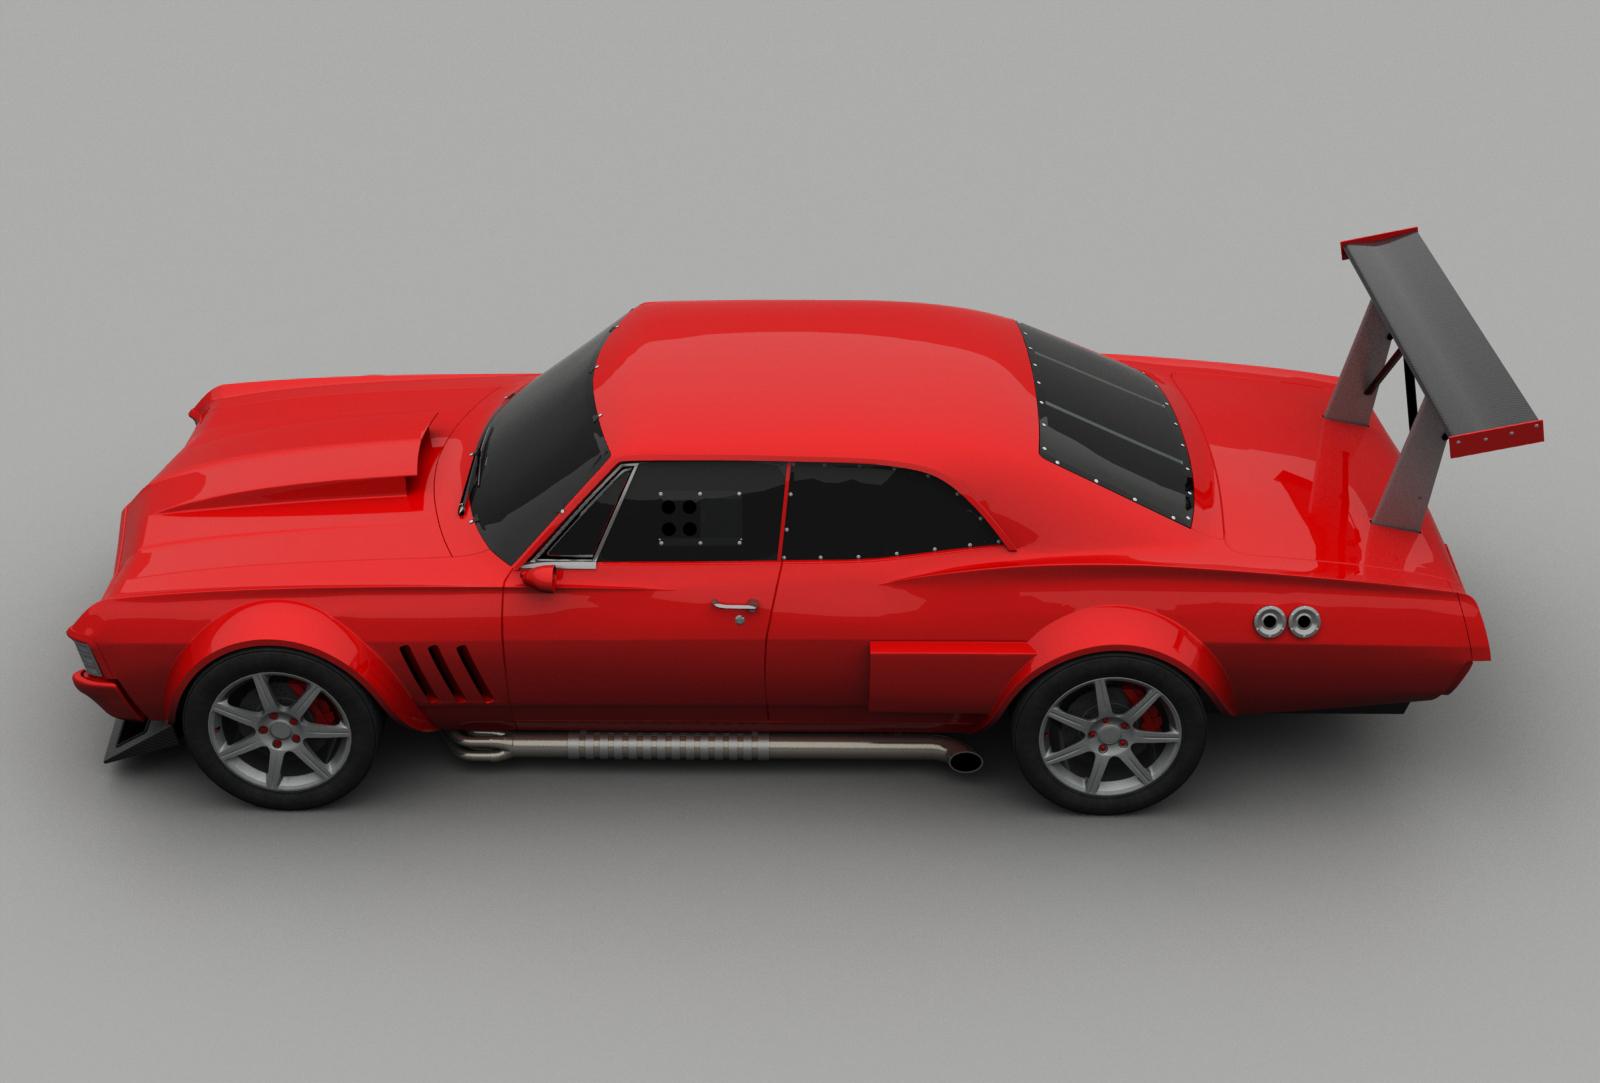 2013-03_The Crew_F.Beudin_Chevrolet Impala-1967-Racing_06